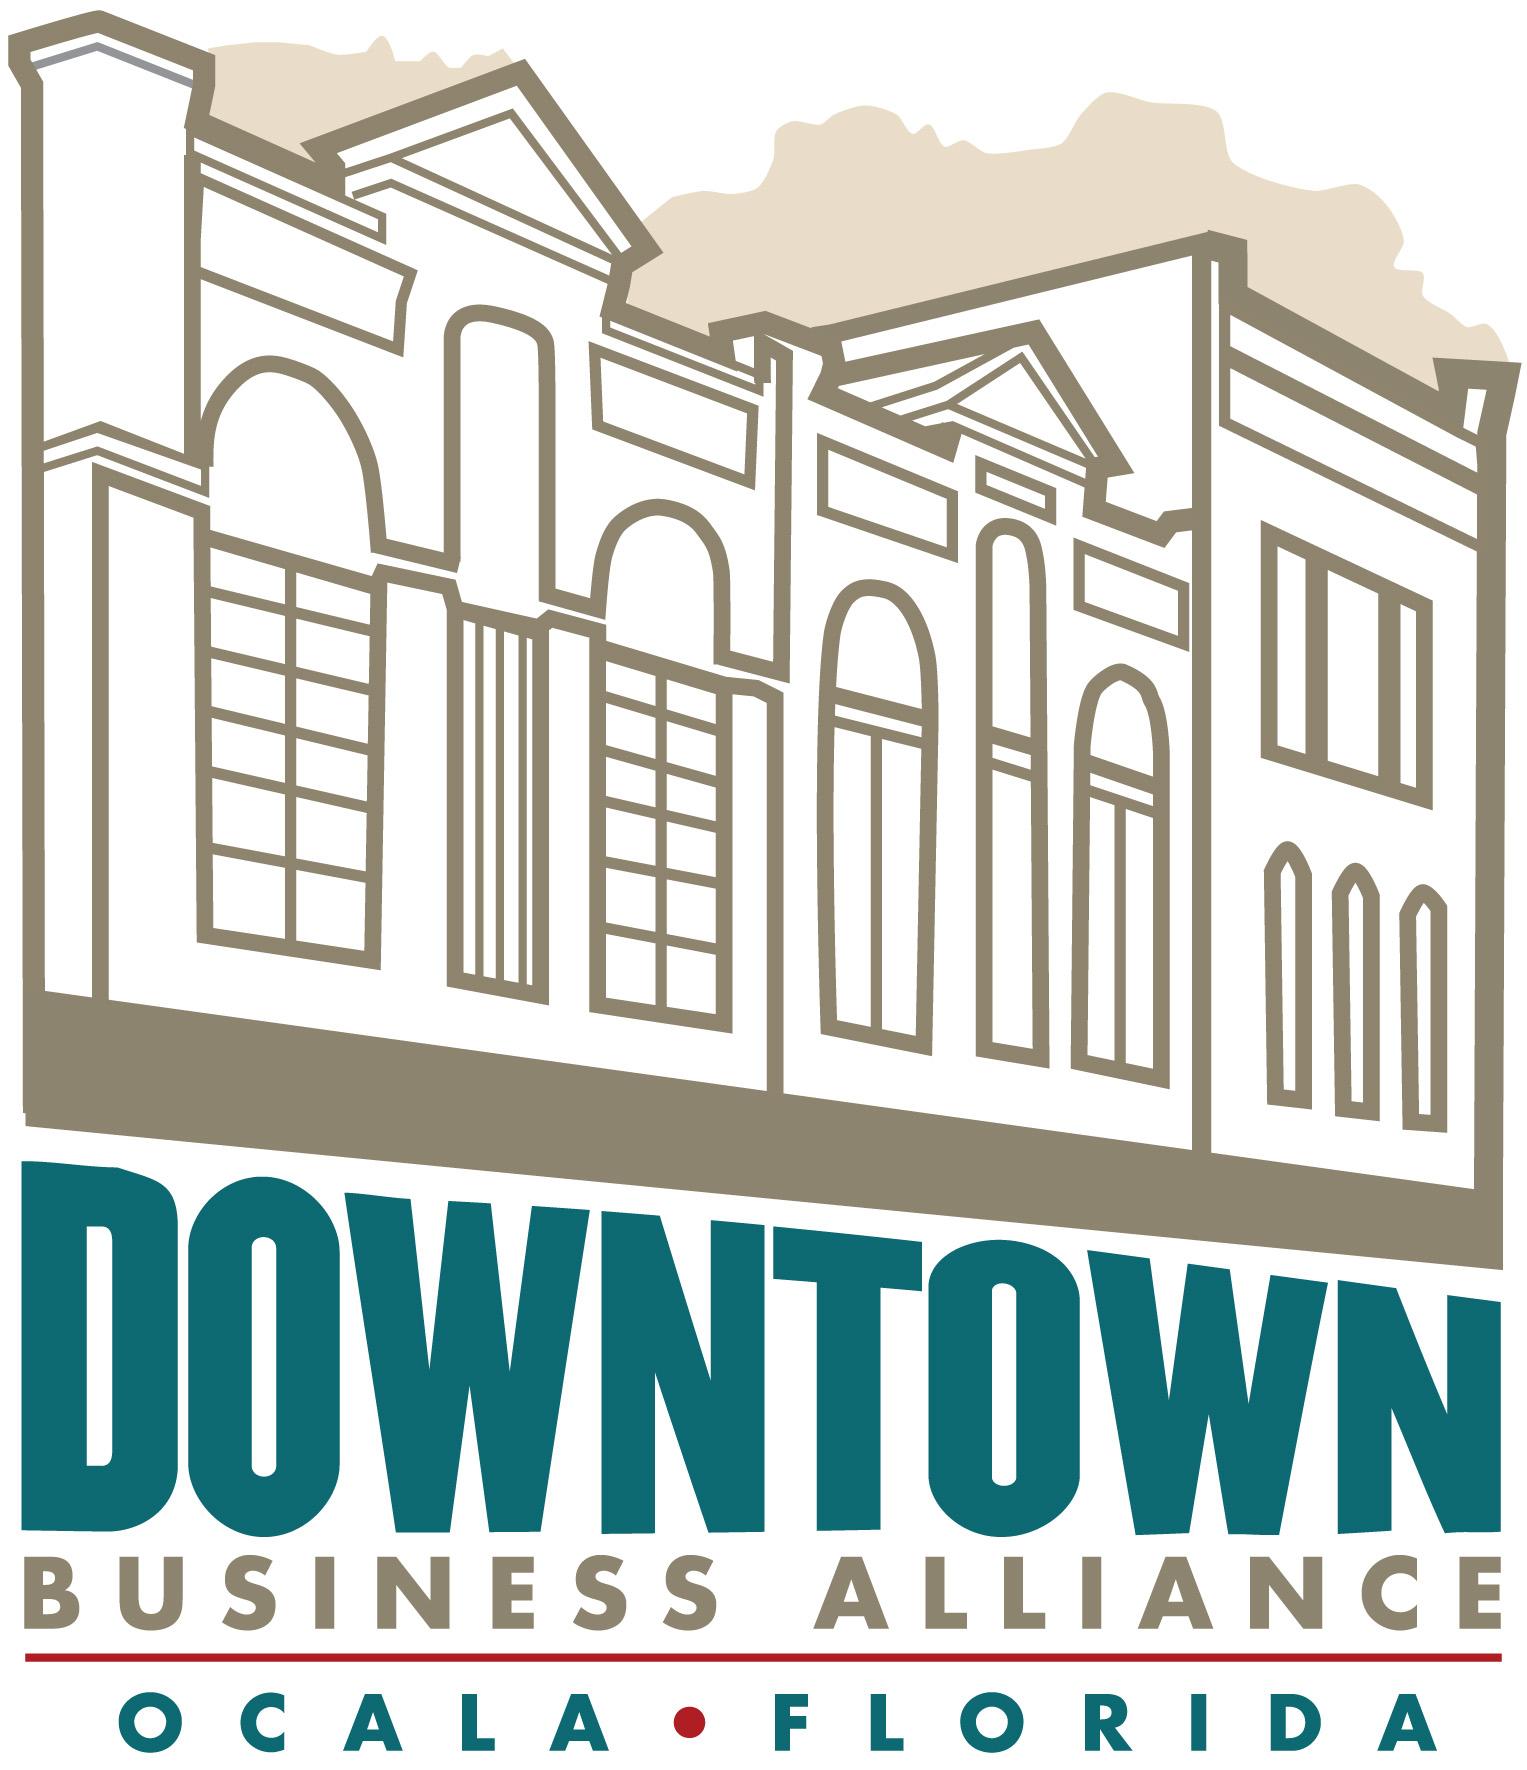 Business clipart downtown Florida Ocala Ocala Ocala Alliance